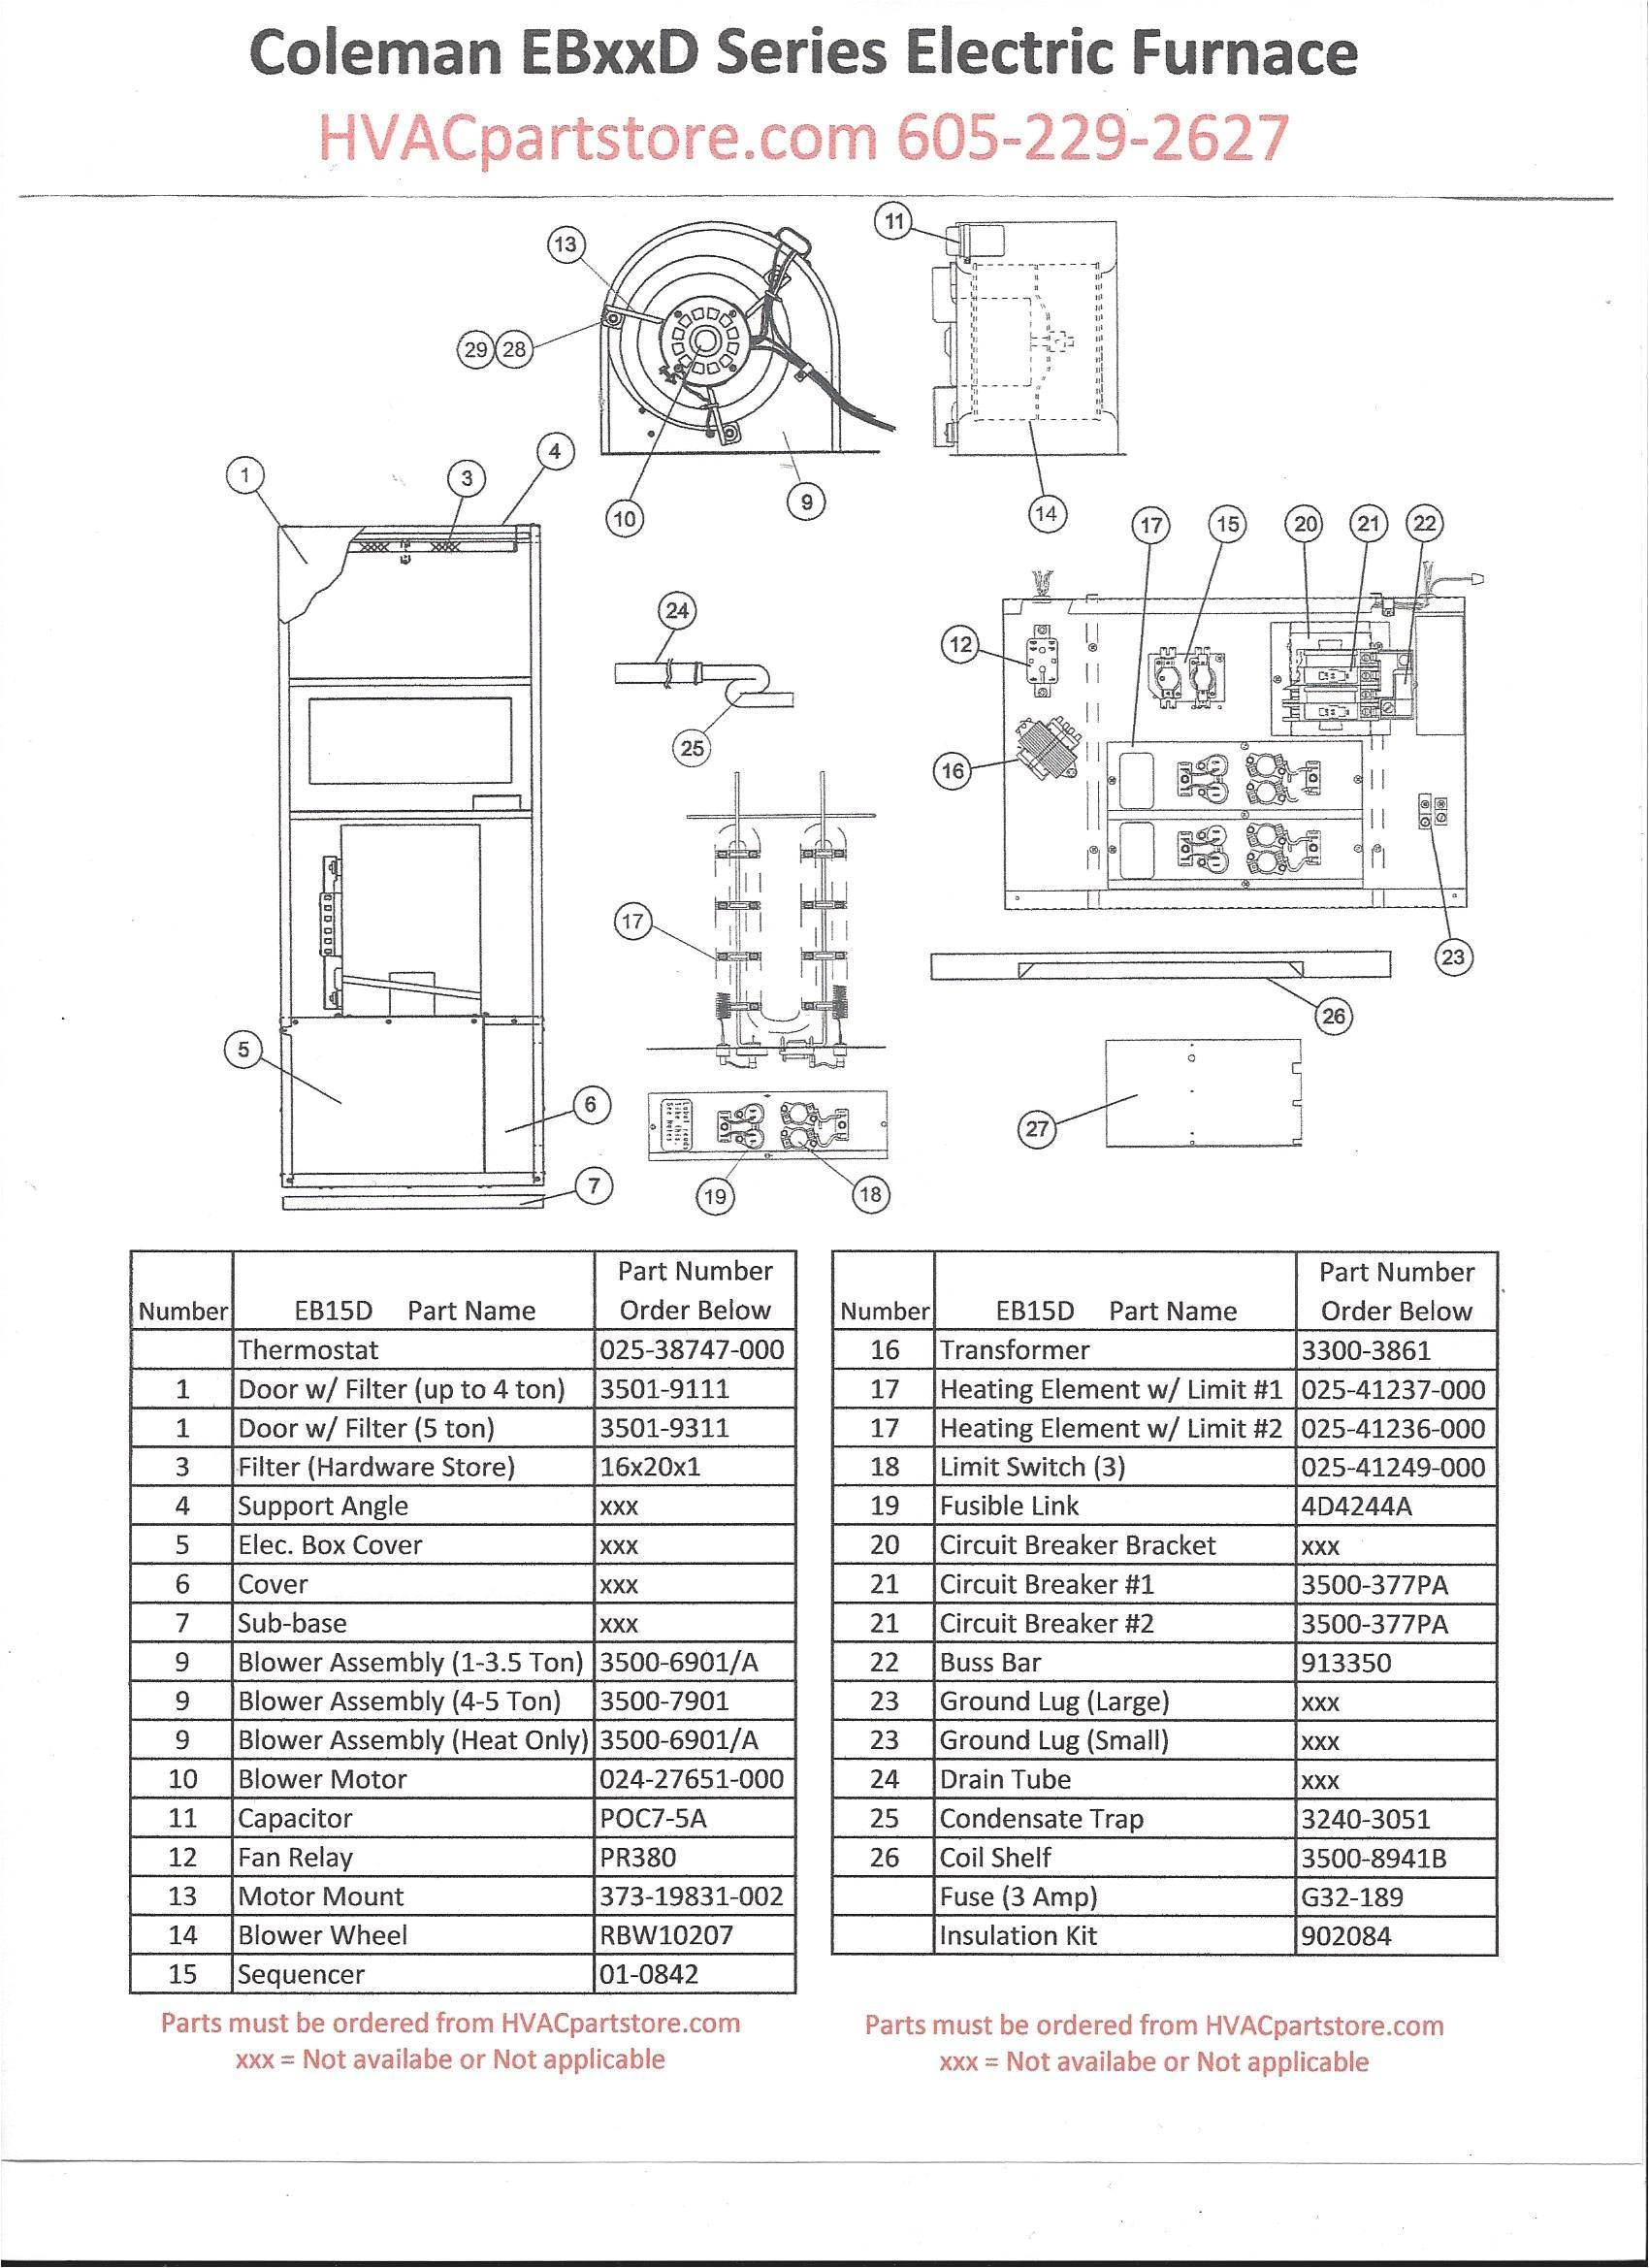 Electric Furnace Wiring Diagram Electric Furnace Wiring Wiring Diagram Technic